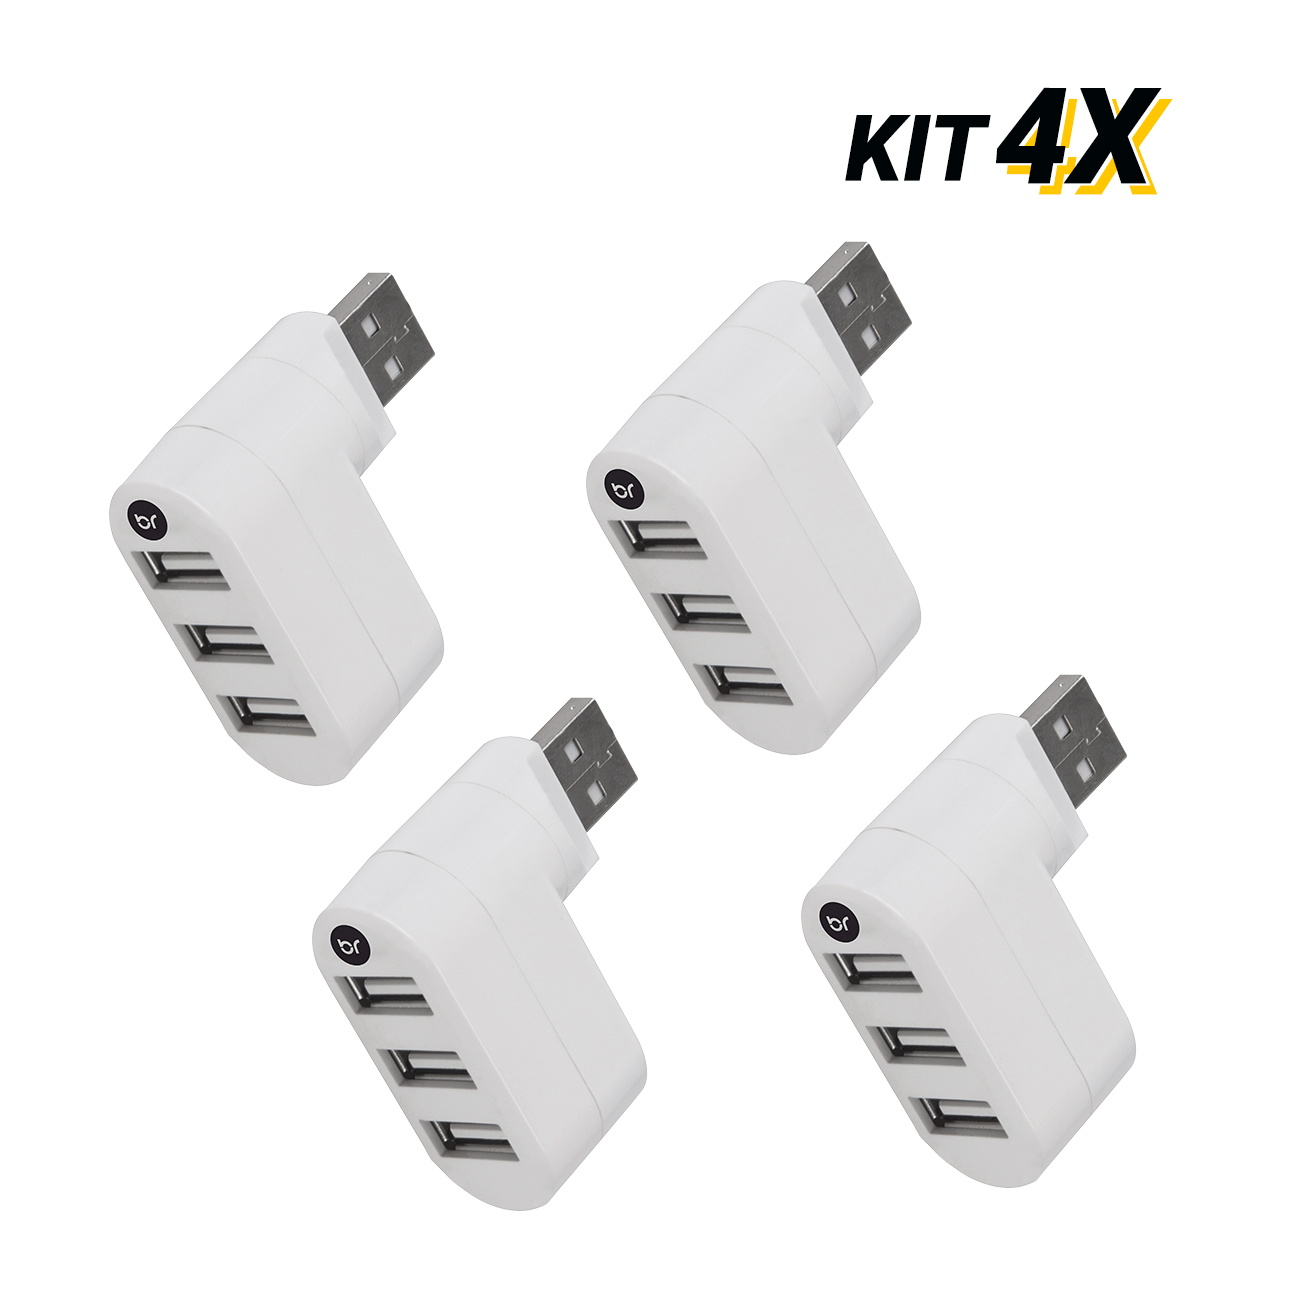 Kit 4 Mini Hub Usb Conector Giratório Com 3 Portas 2.0 Fast